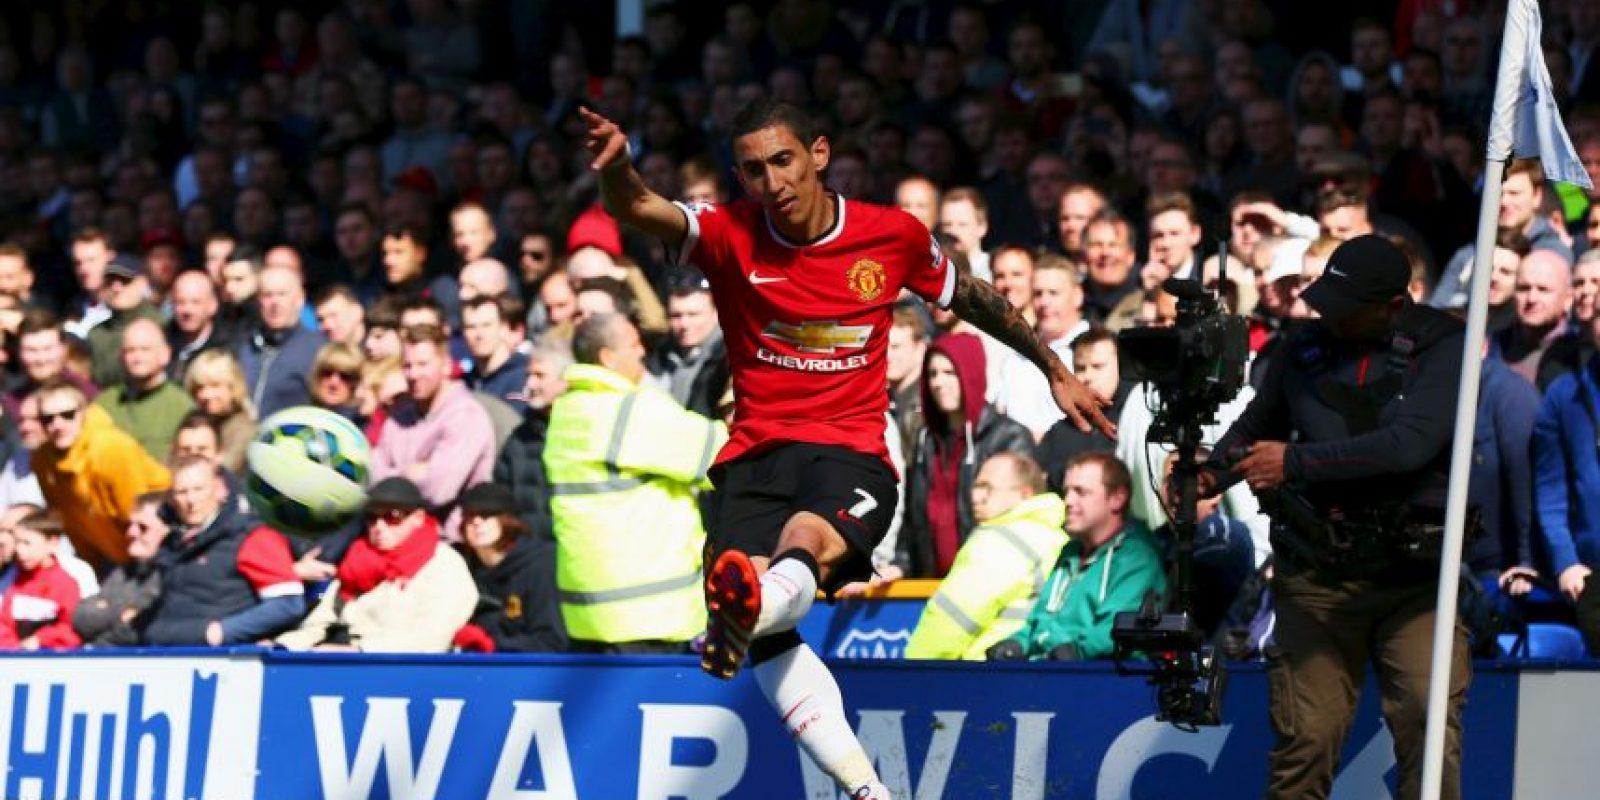 Llega procedente del Manchester United Foto:Getty Images